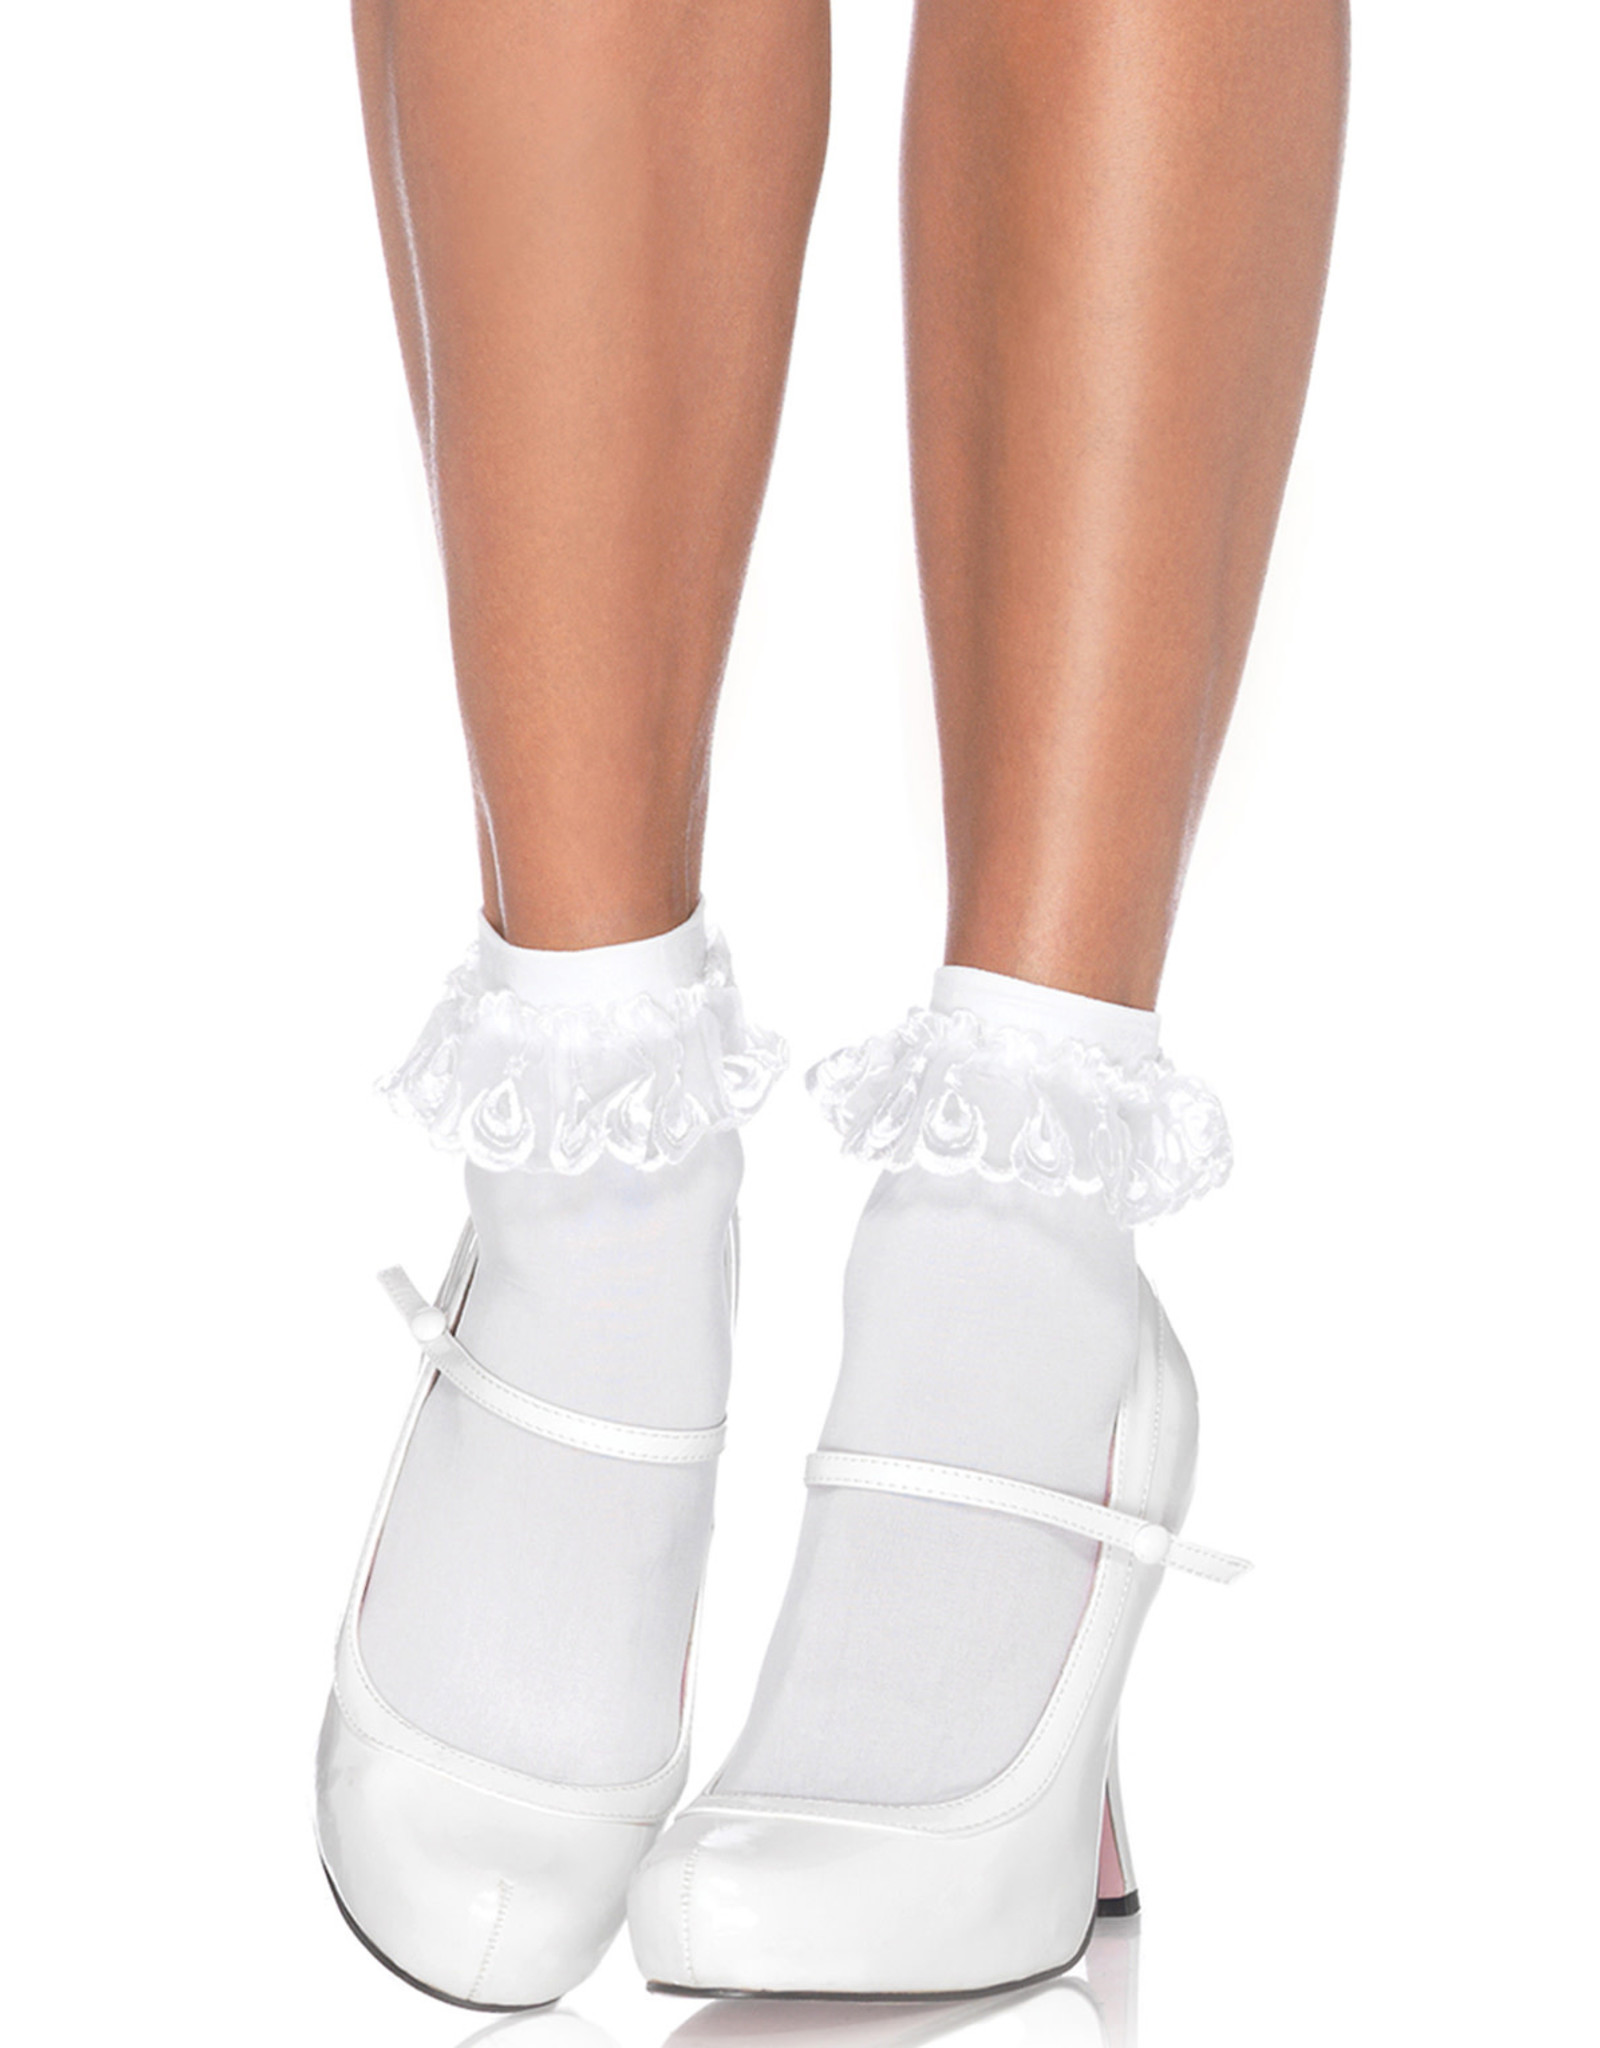 LEG AVENUE ANKLET W/ LACE RUFFLE WHITE